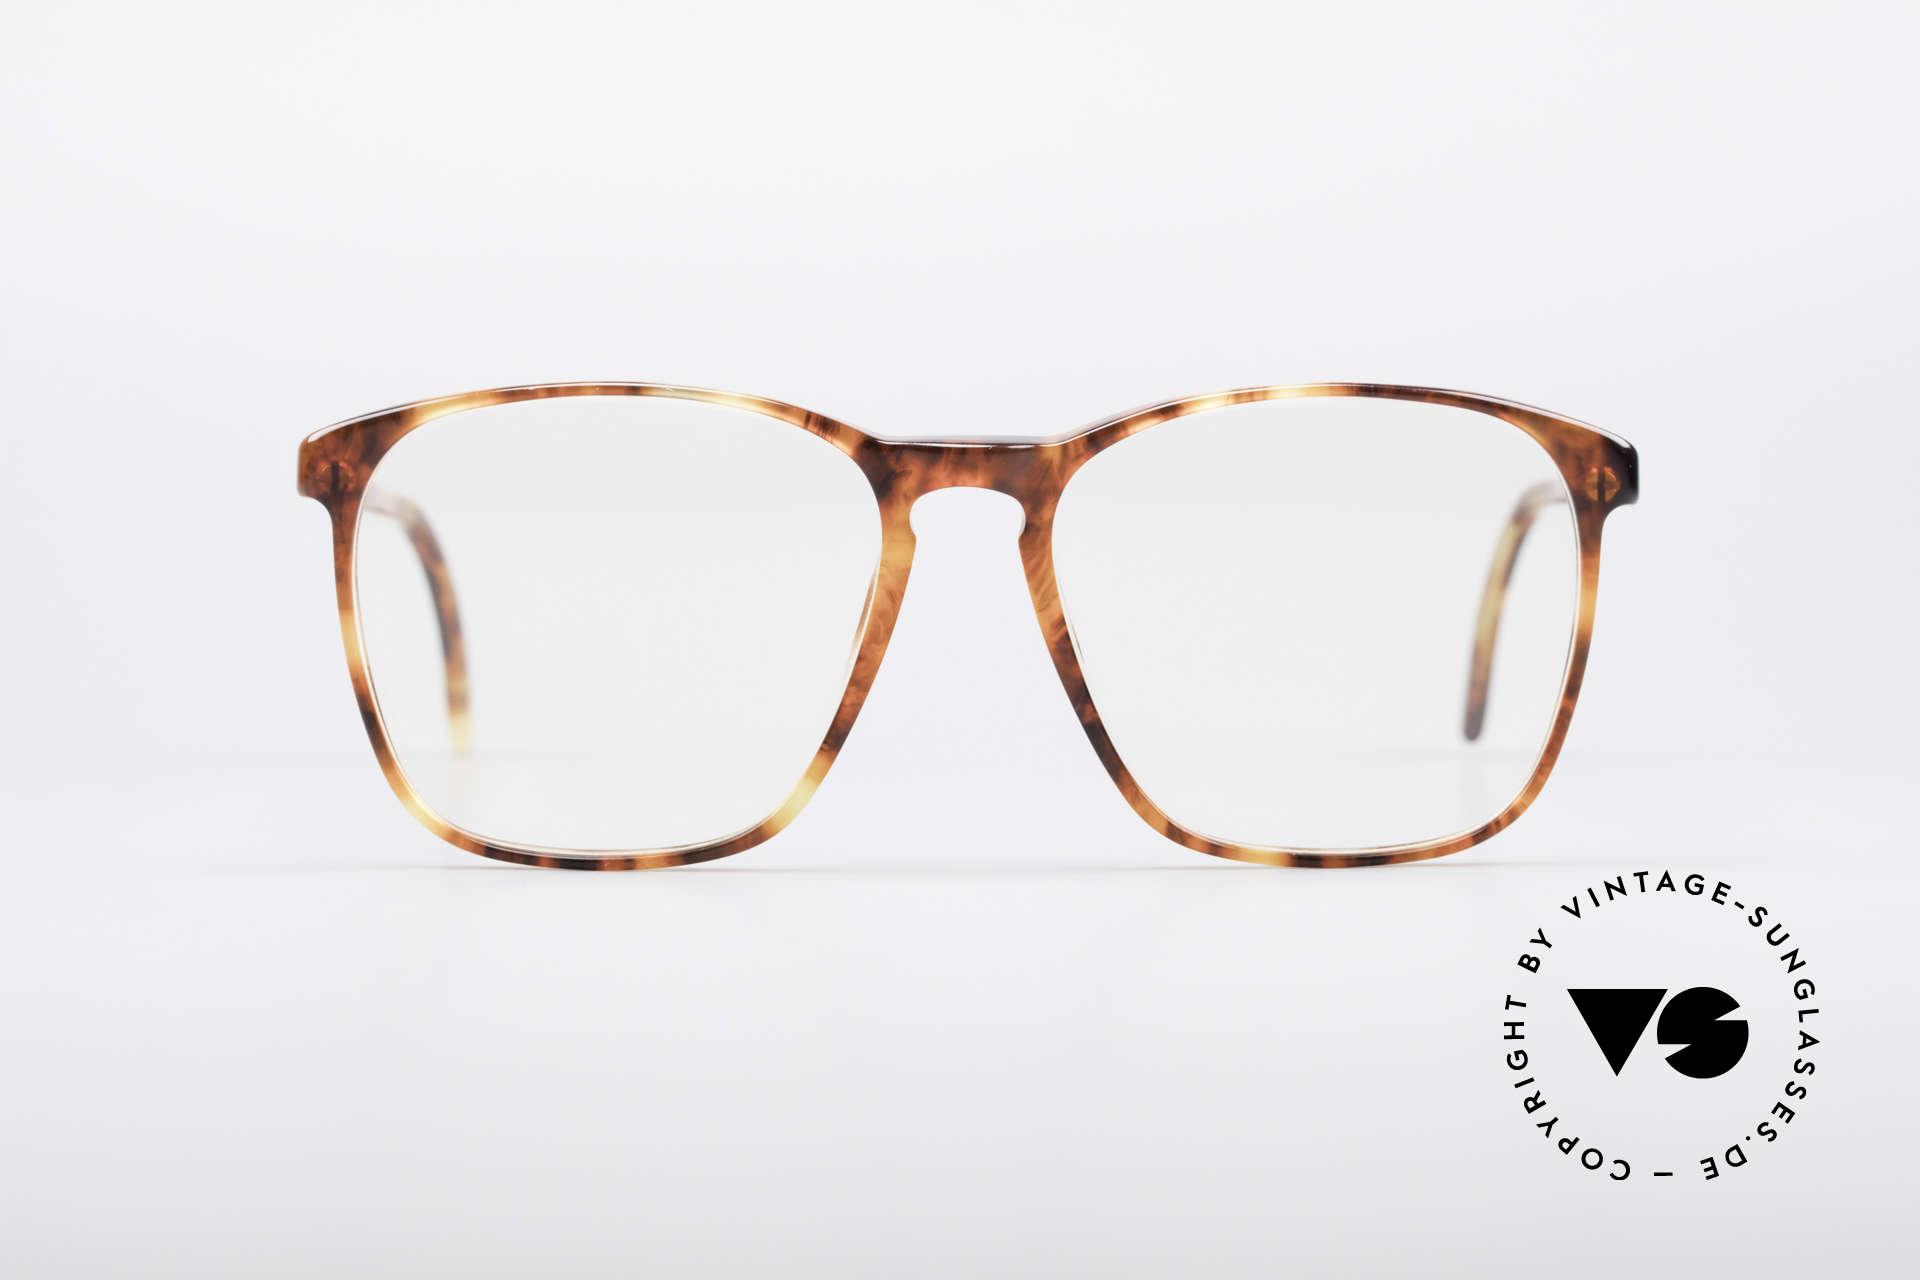 Giorgio Armani 328 True Vintage Designer Glasses, classic, timeless, elegant = characteristic of GA, Made for Men